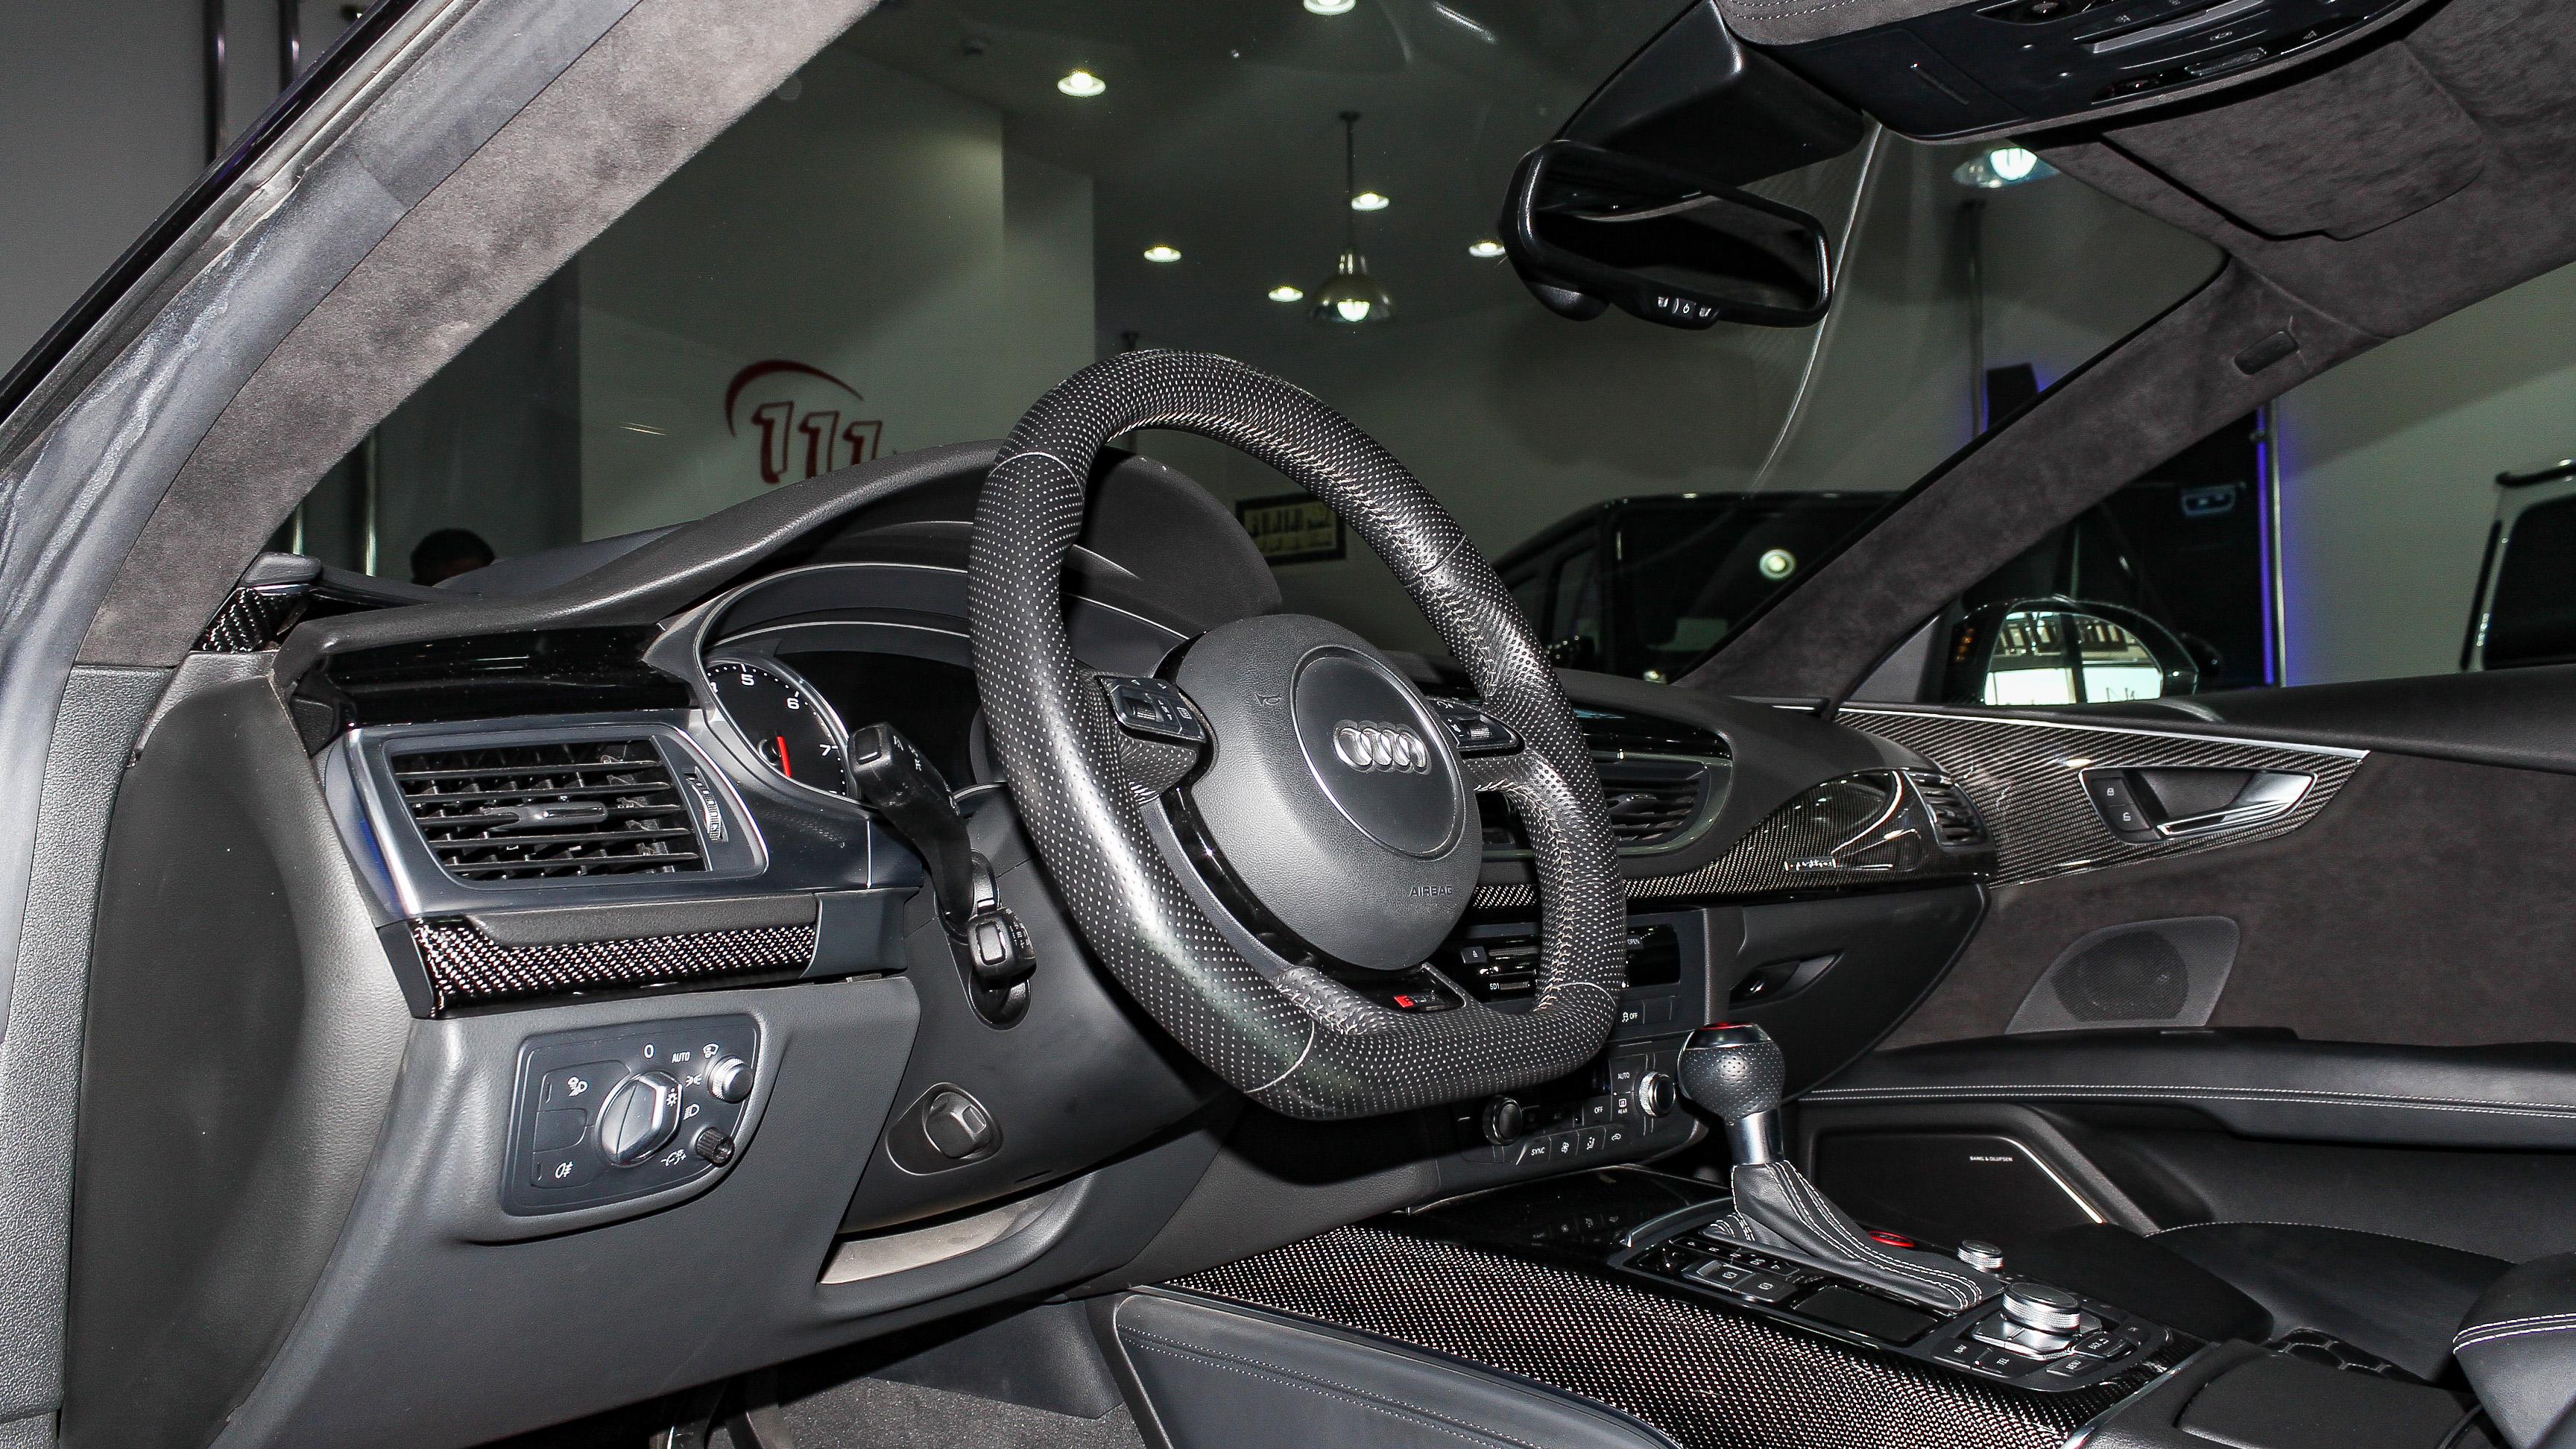 2016-Audi-RS7-Blue-Black-GCC-04.jpg